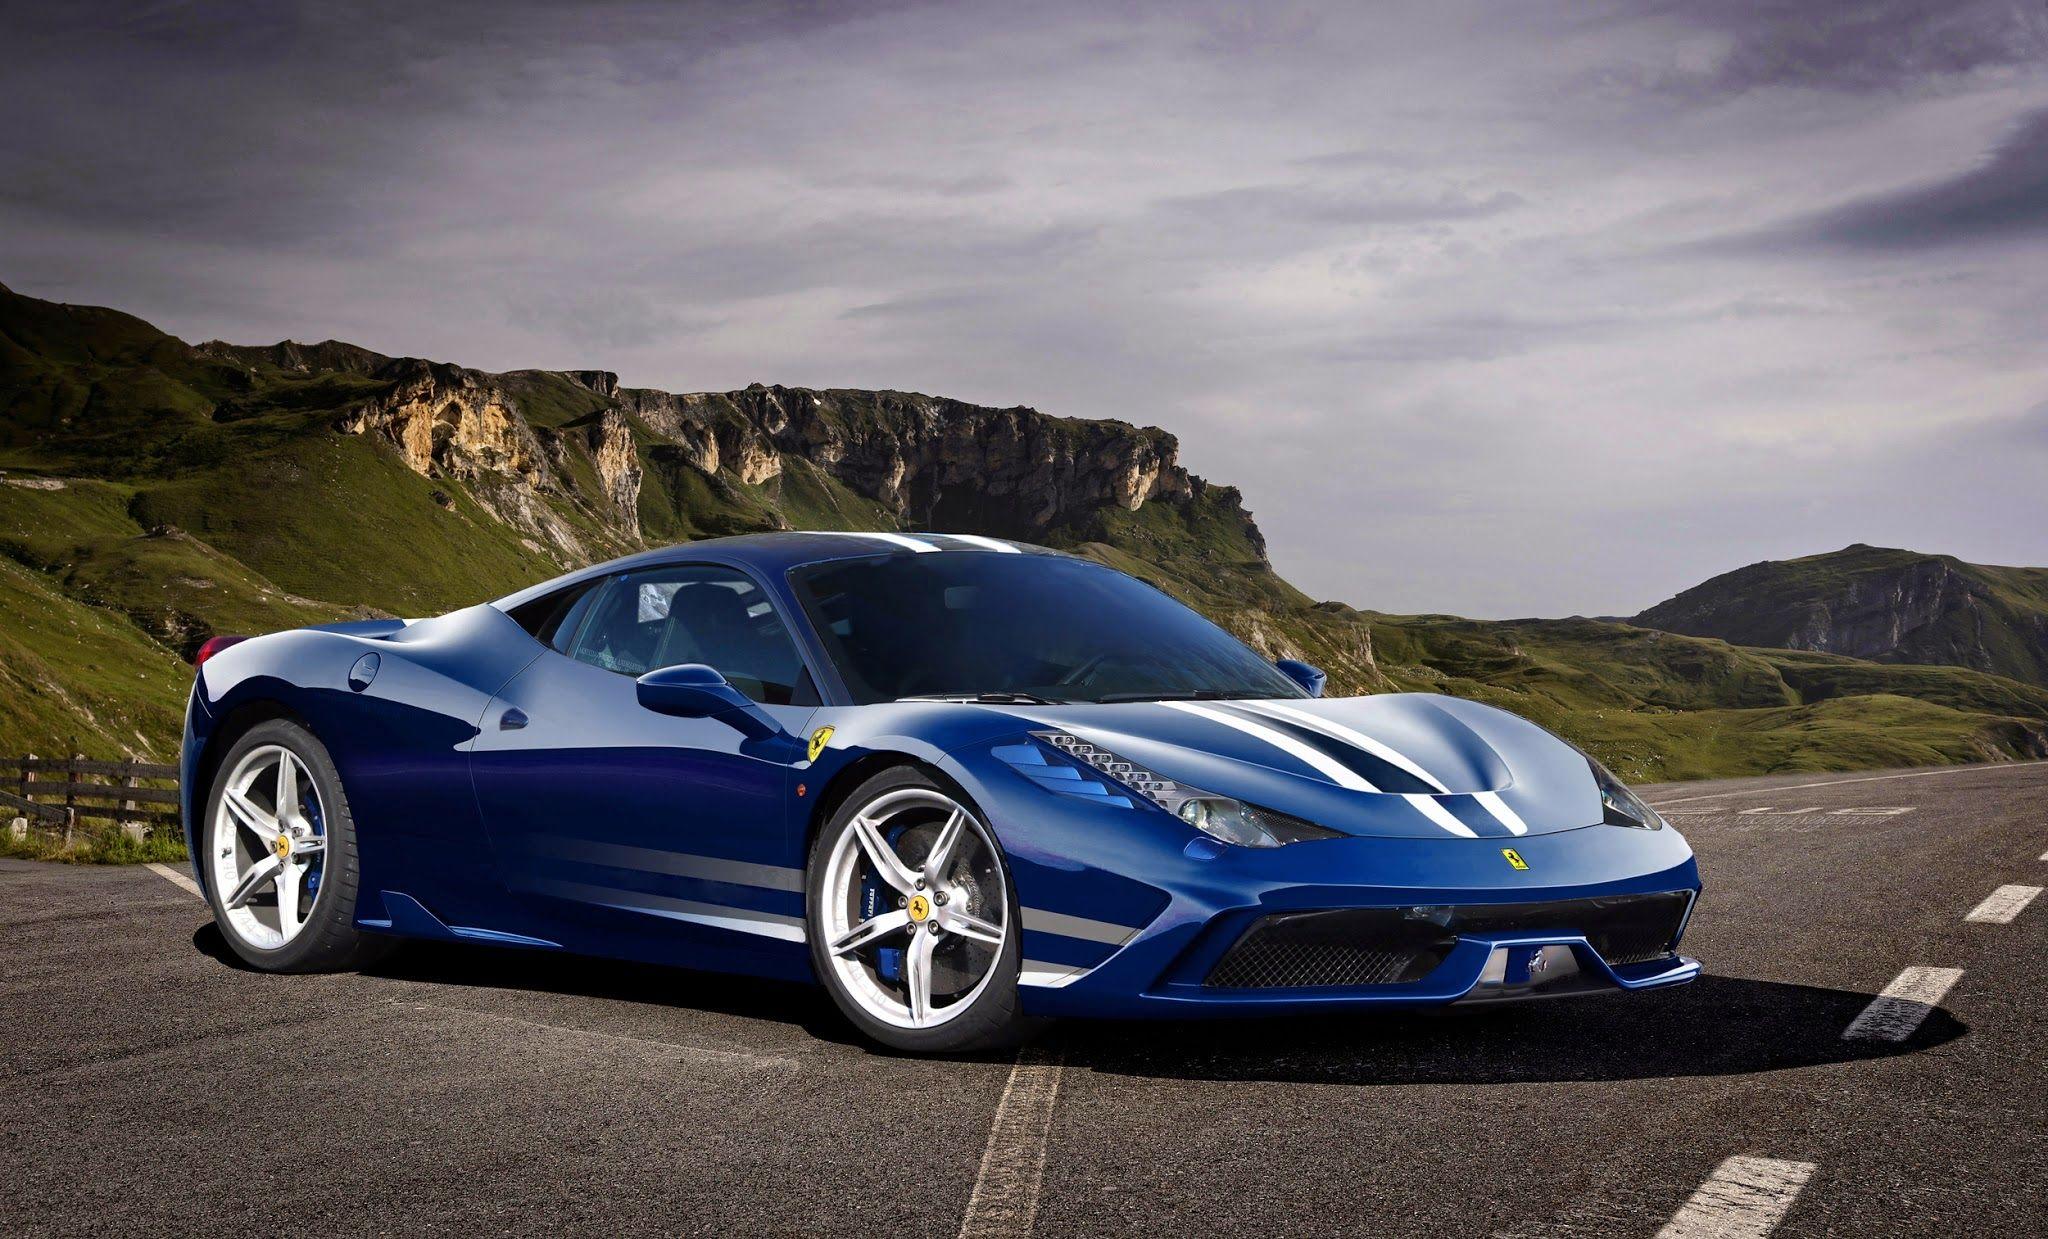 Ferrari 458 Speciale Blue Ferrari 458 Ferrari 458 Speciale Super Cars Ferrari speciale wallpaper hd